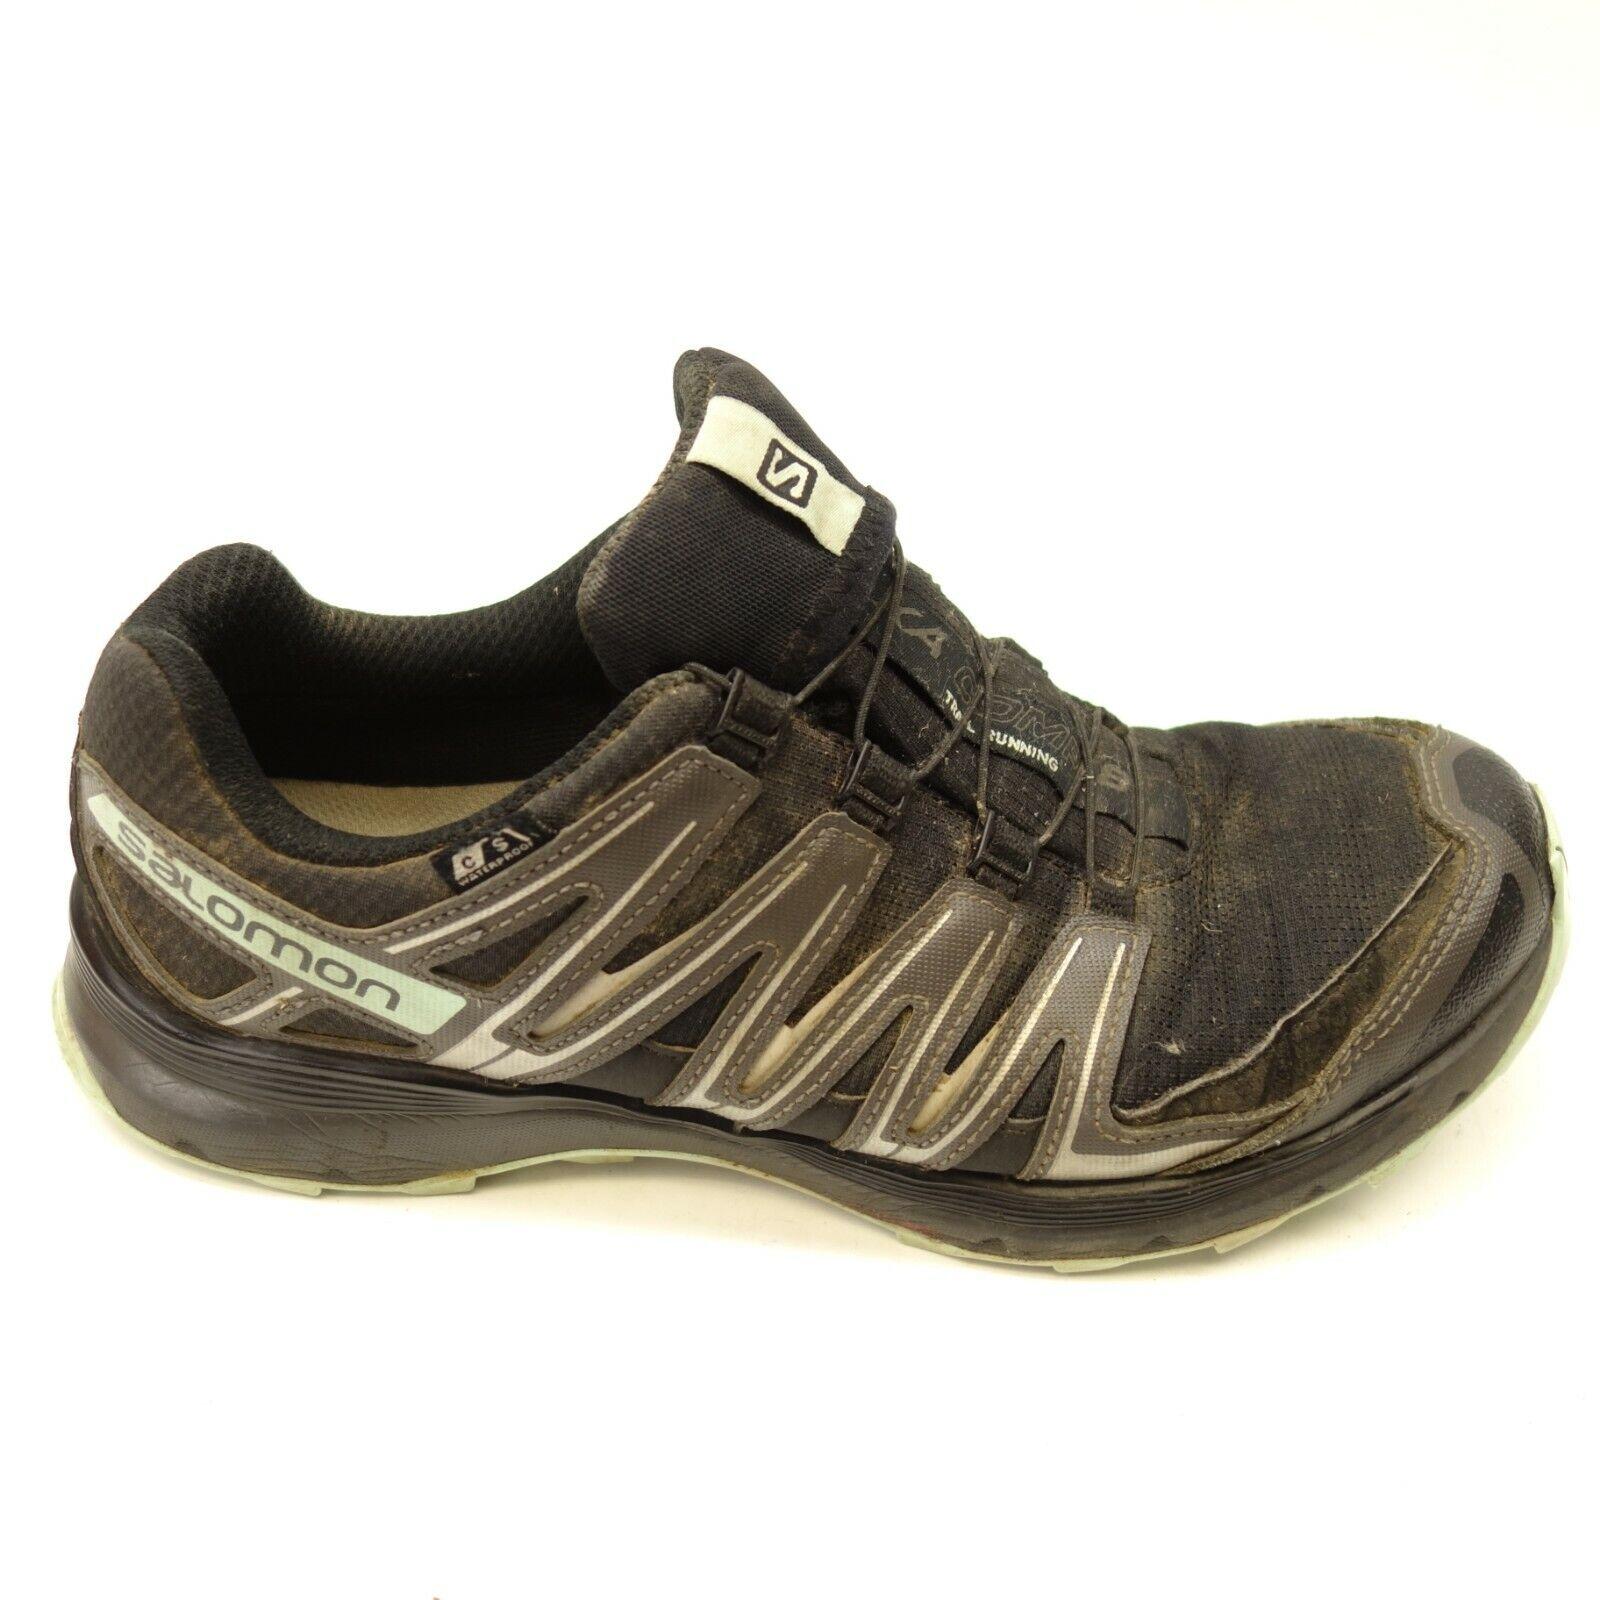 Tamaris Sling sandalias pinar 1 1 29502 22 004 negro | eBay